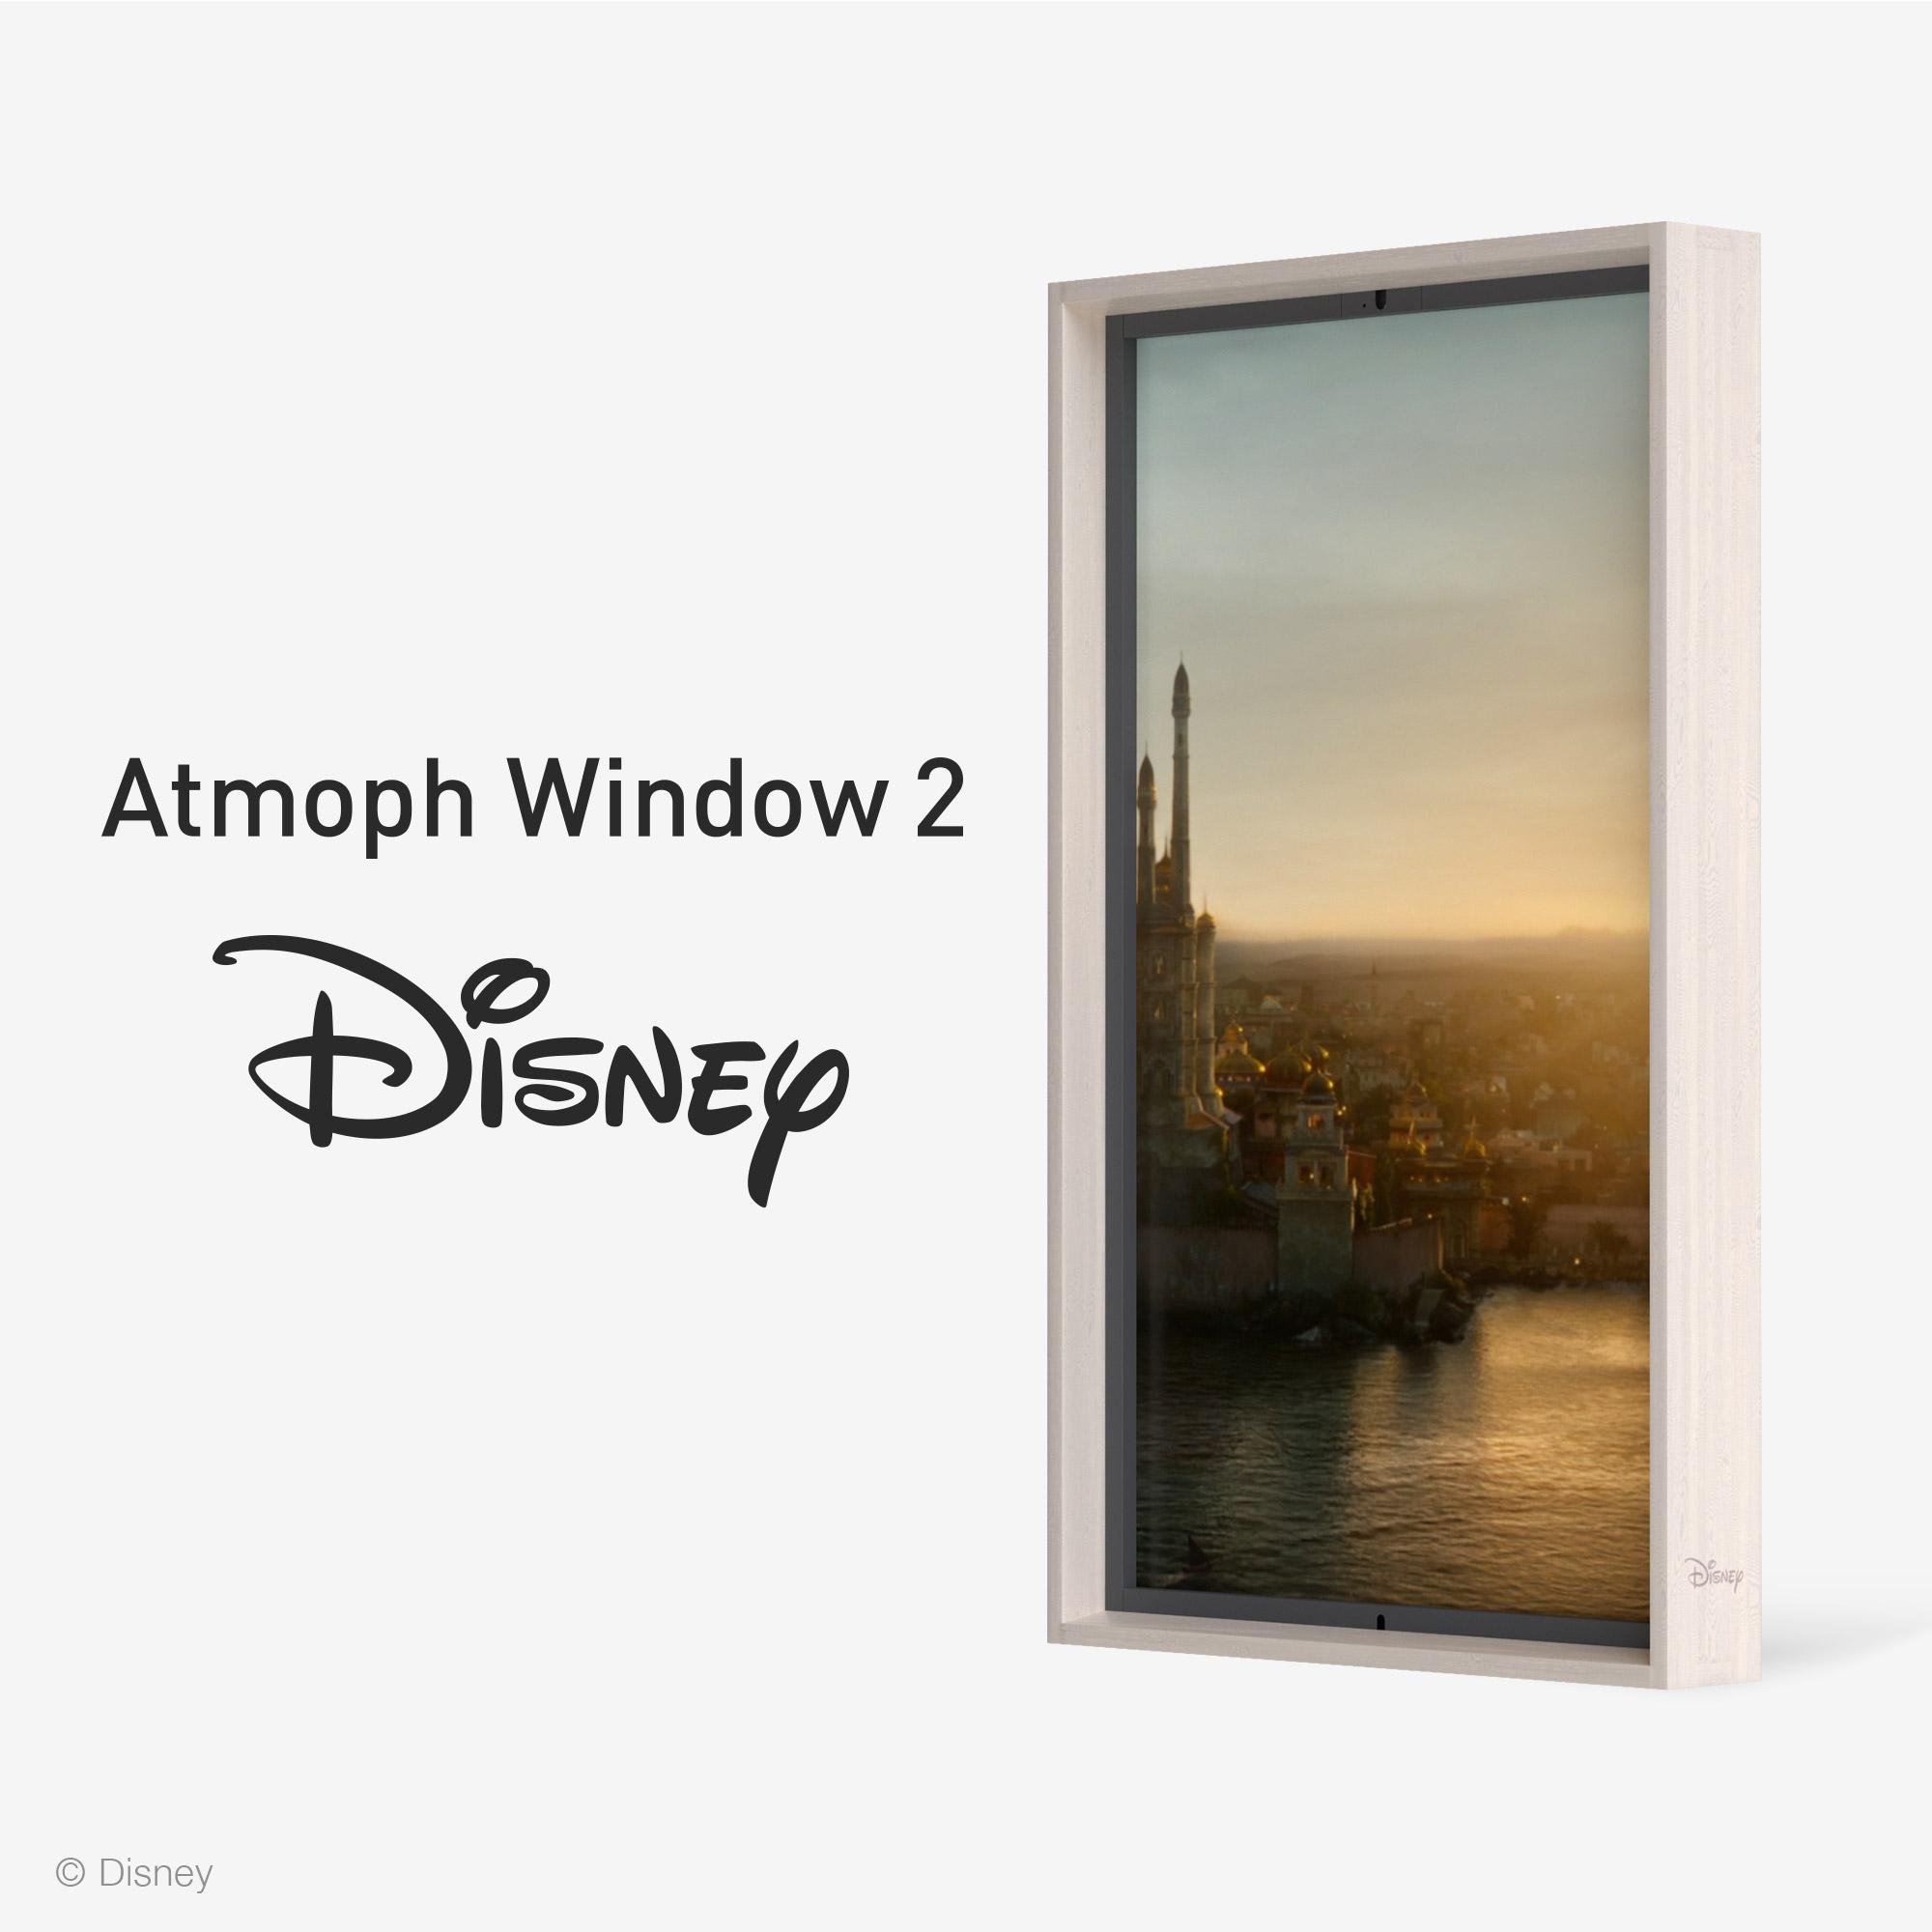 Atmoph window 2 | Disney